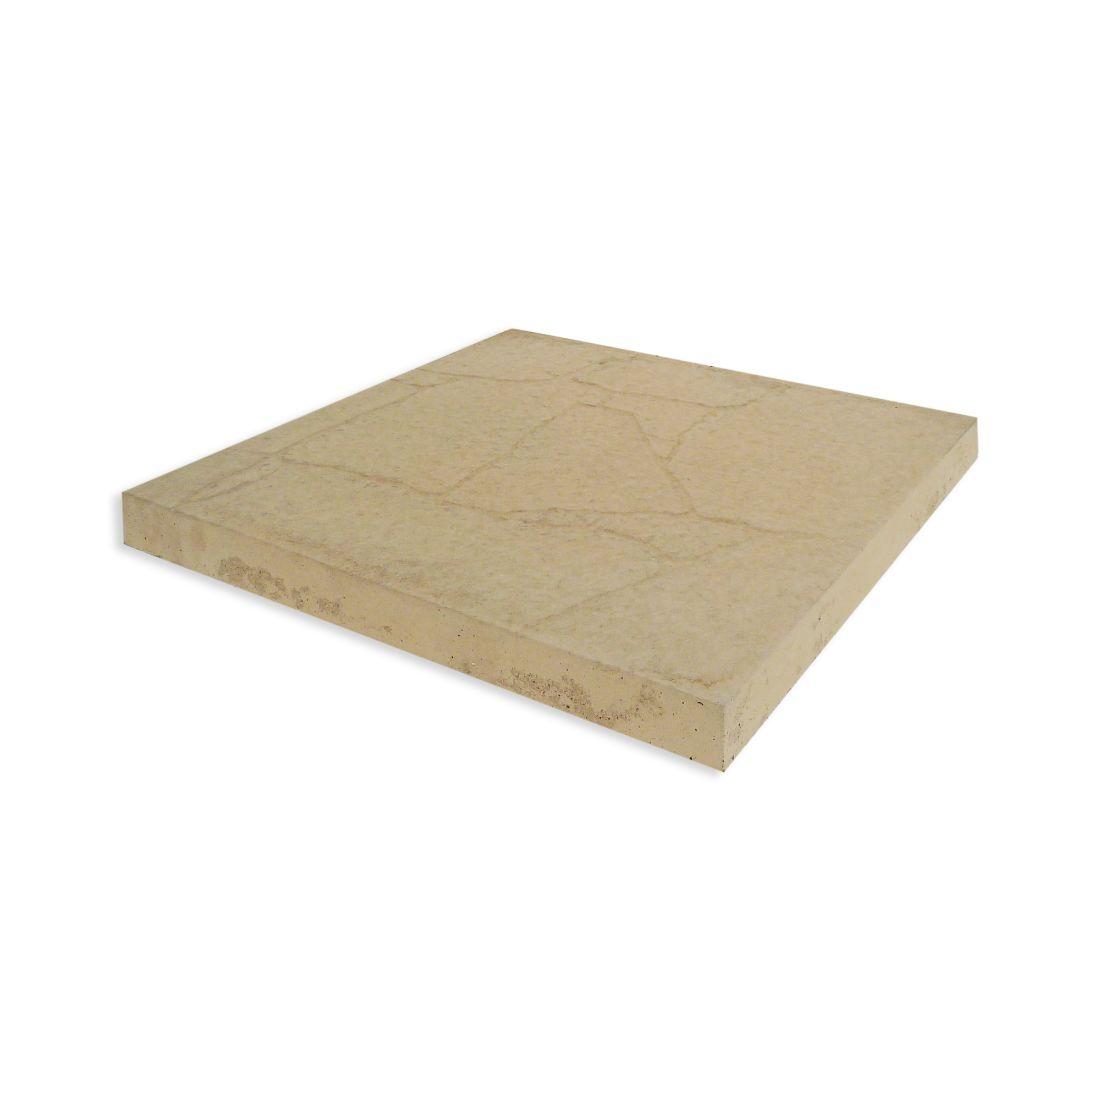 Palazzo Concrete Paver 450 x 450 x 37mm Cream Sands